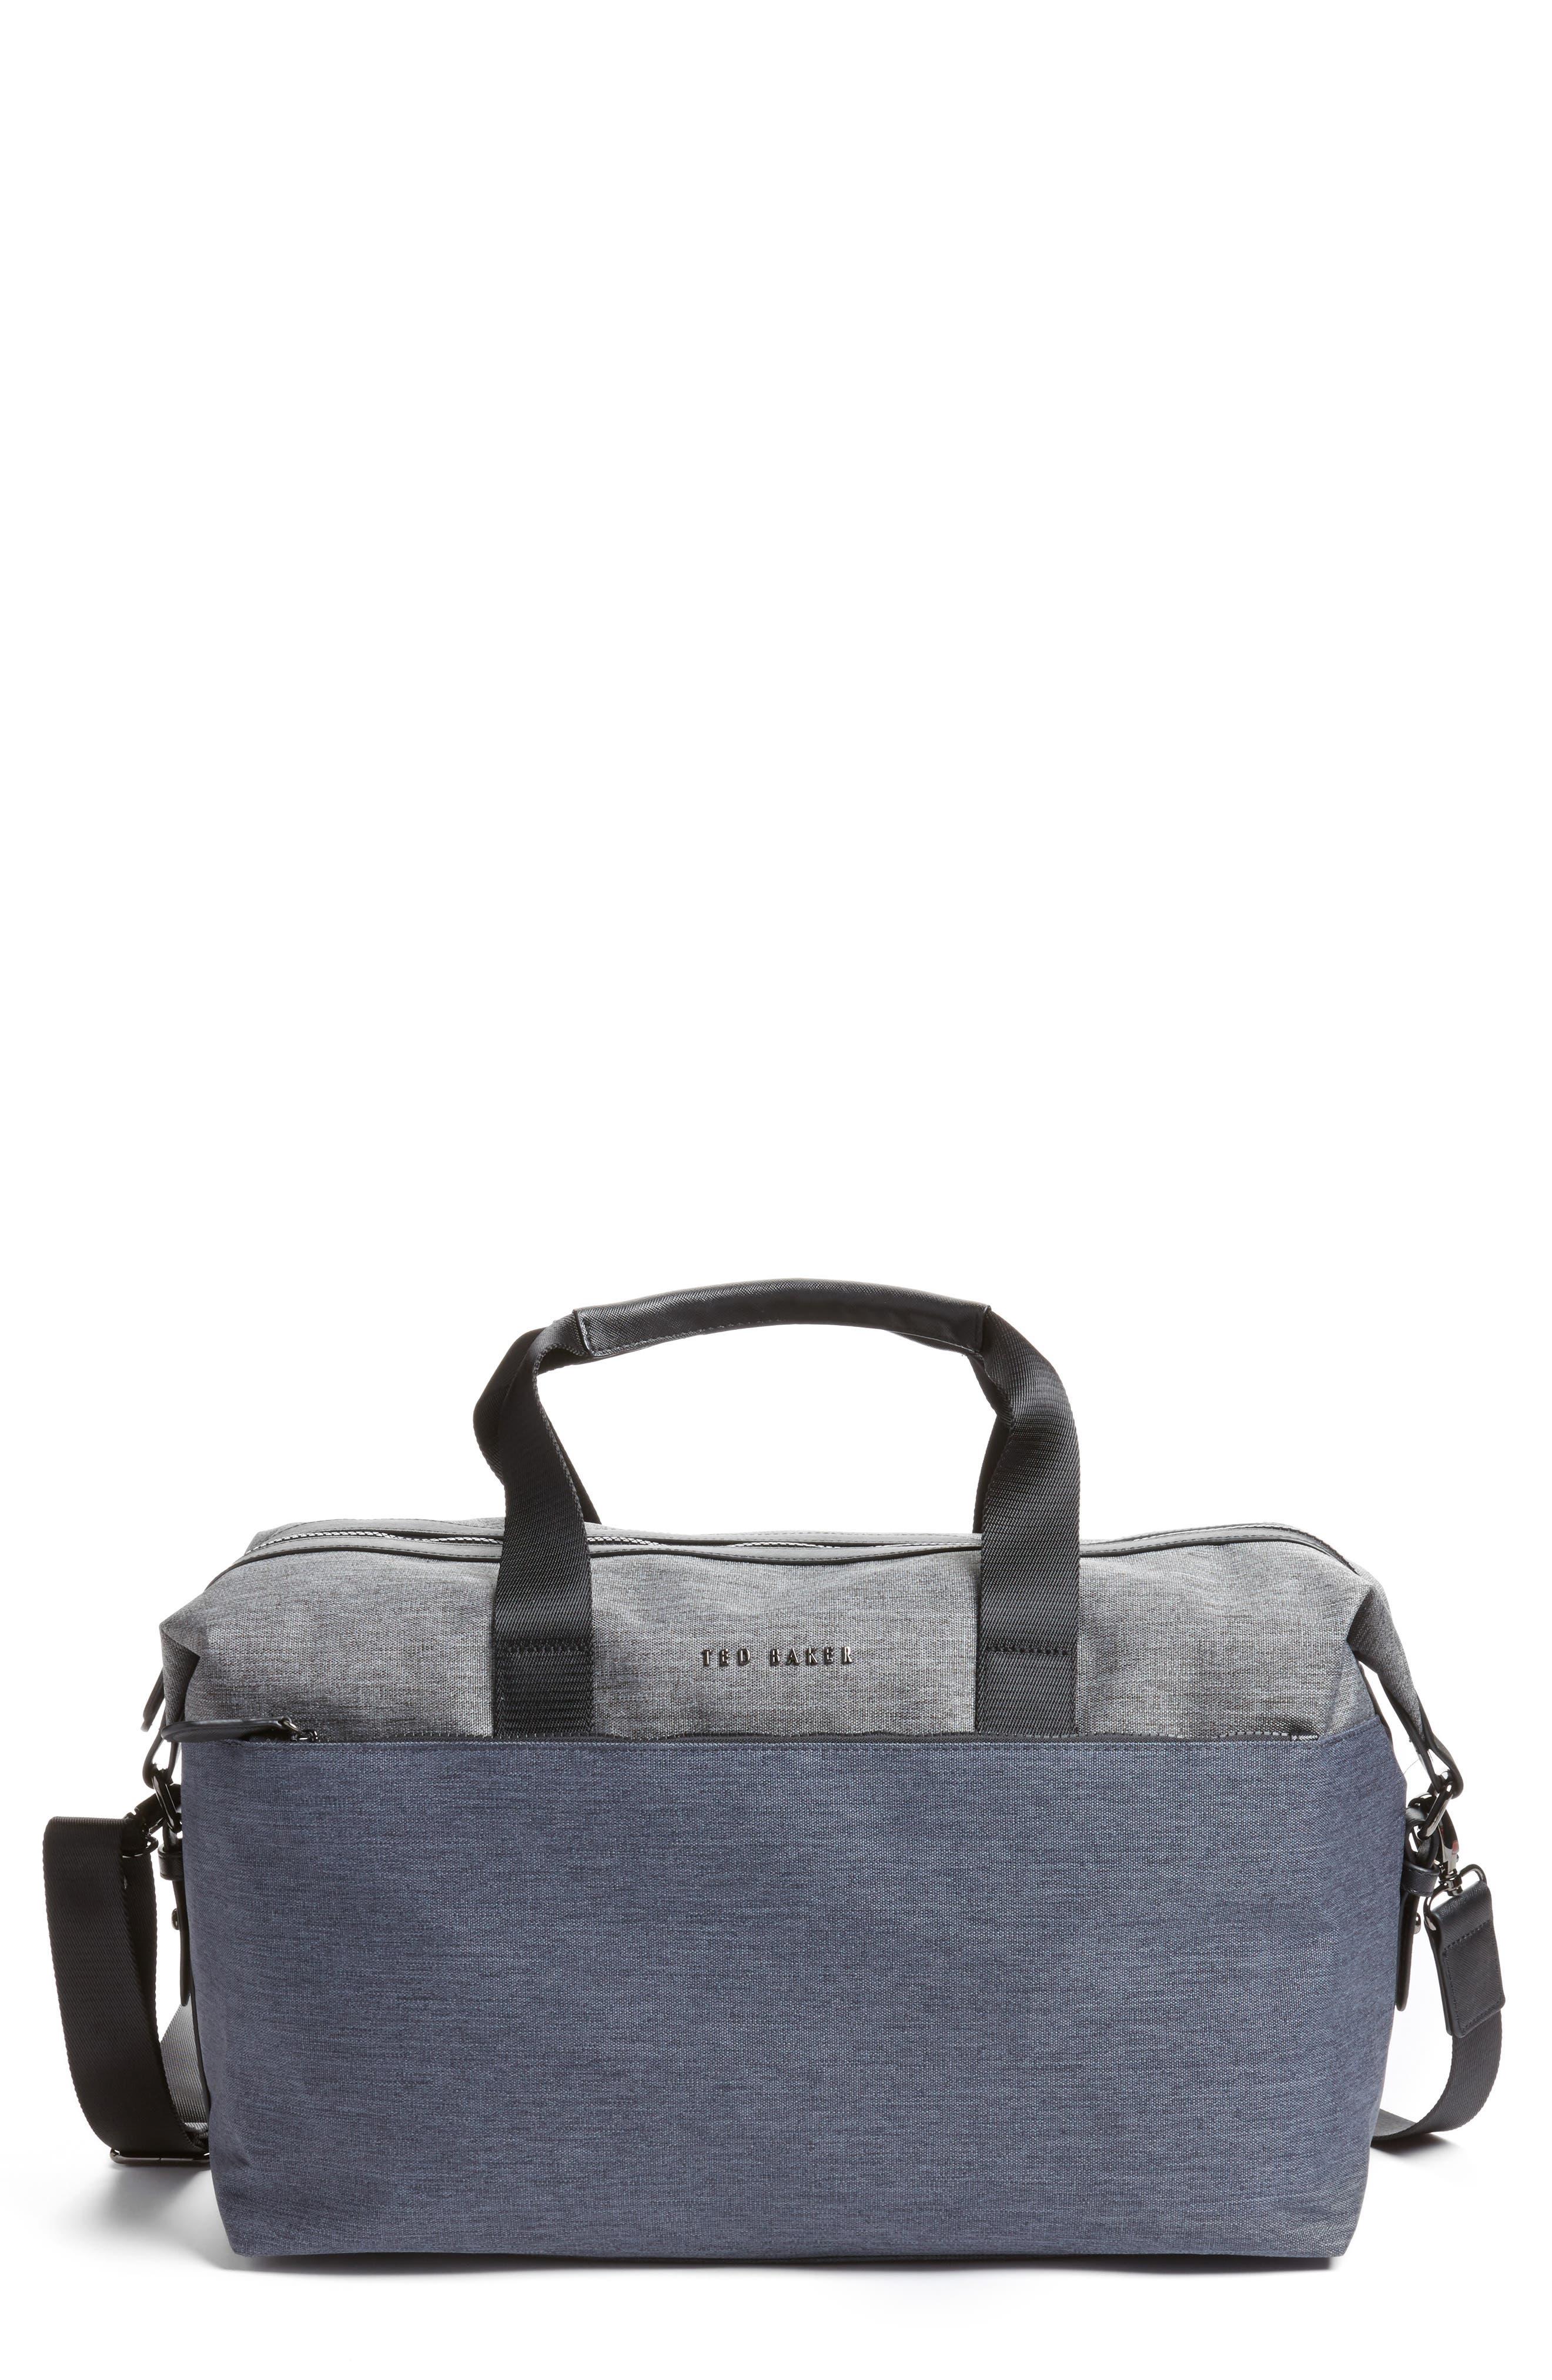 Hamahed Duffel Bag,                         Main,                         color,